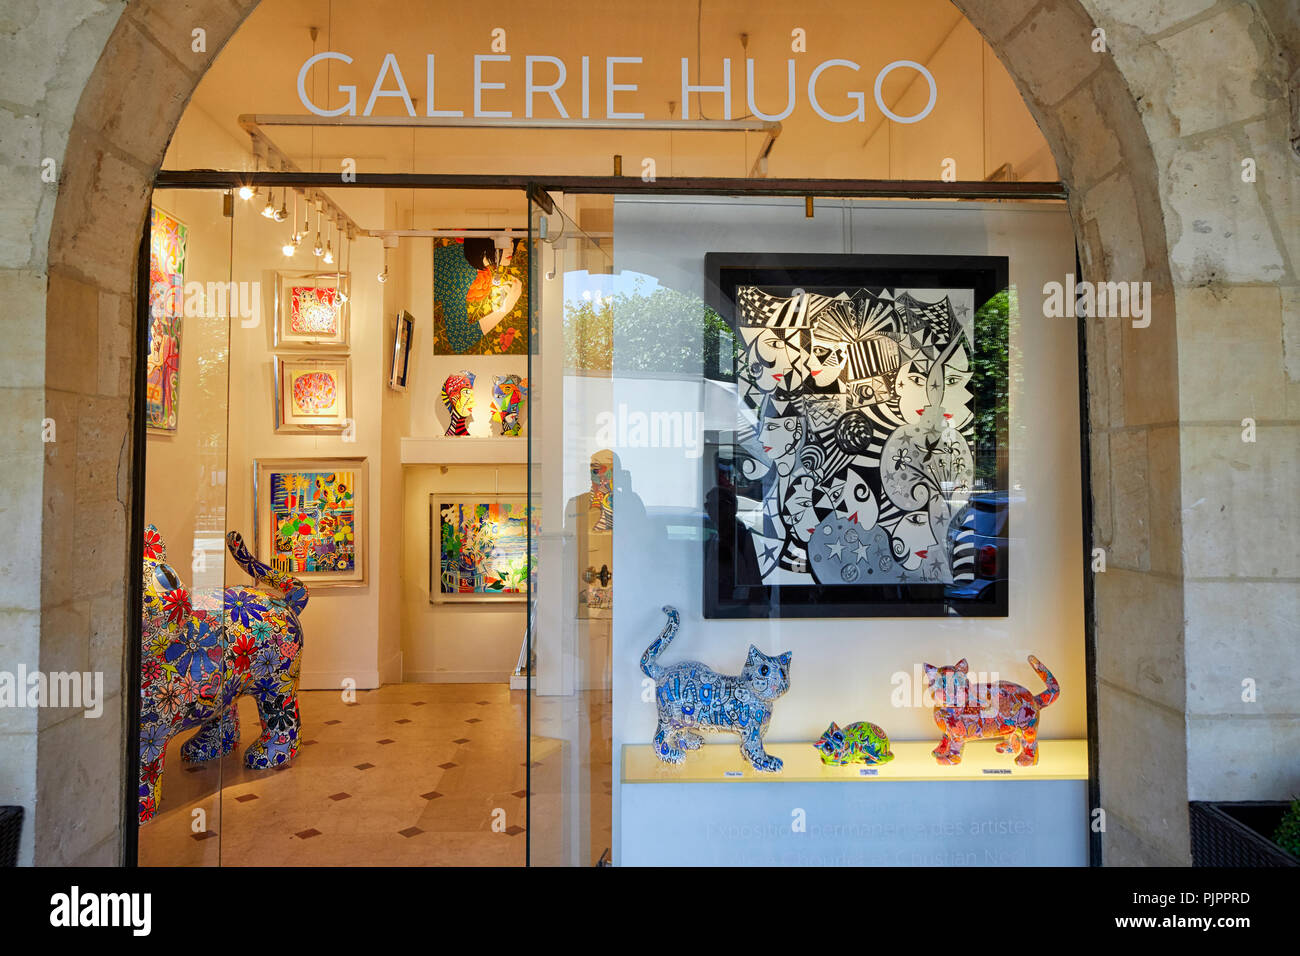 Galerie Hugo in Place des Vosges, the oldest planned square in Paris, Marais district, Paris, France, Europe Stock Photo